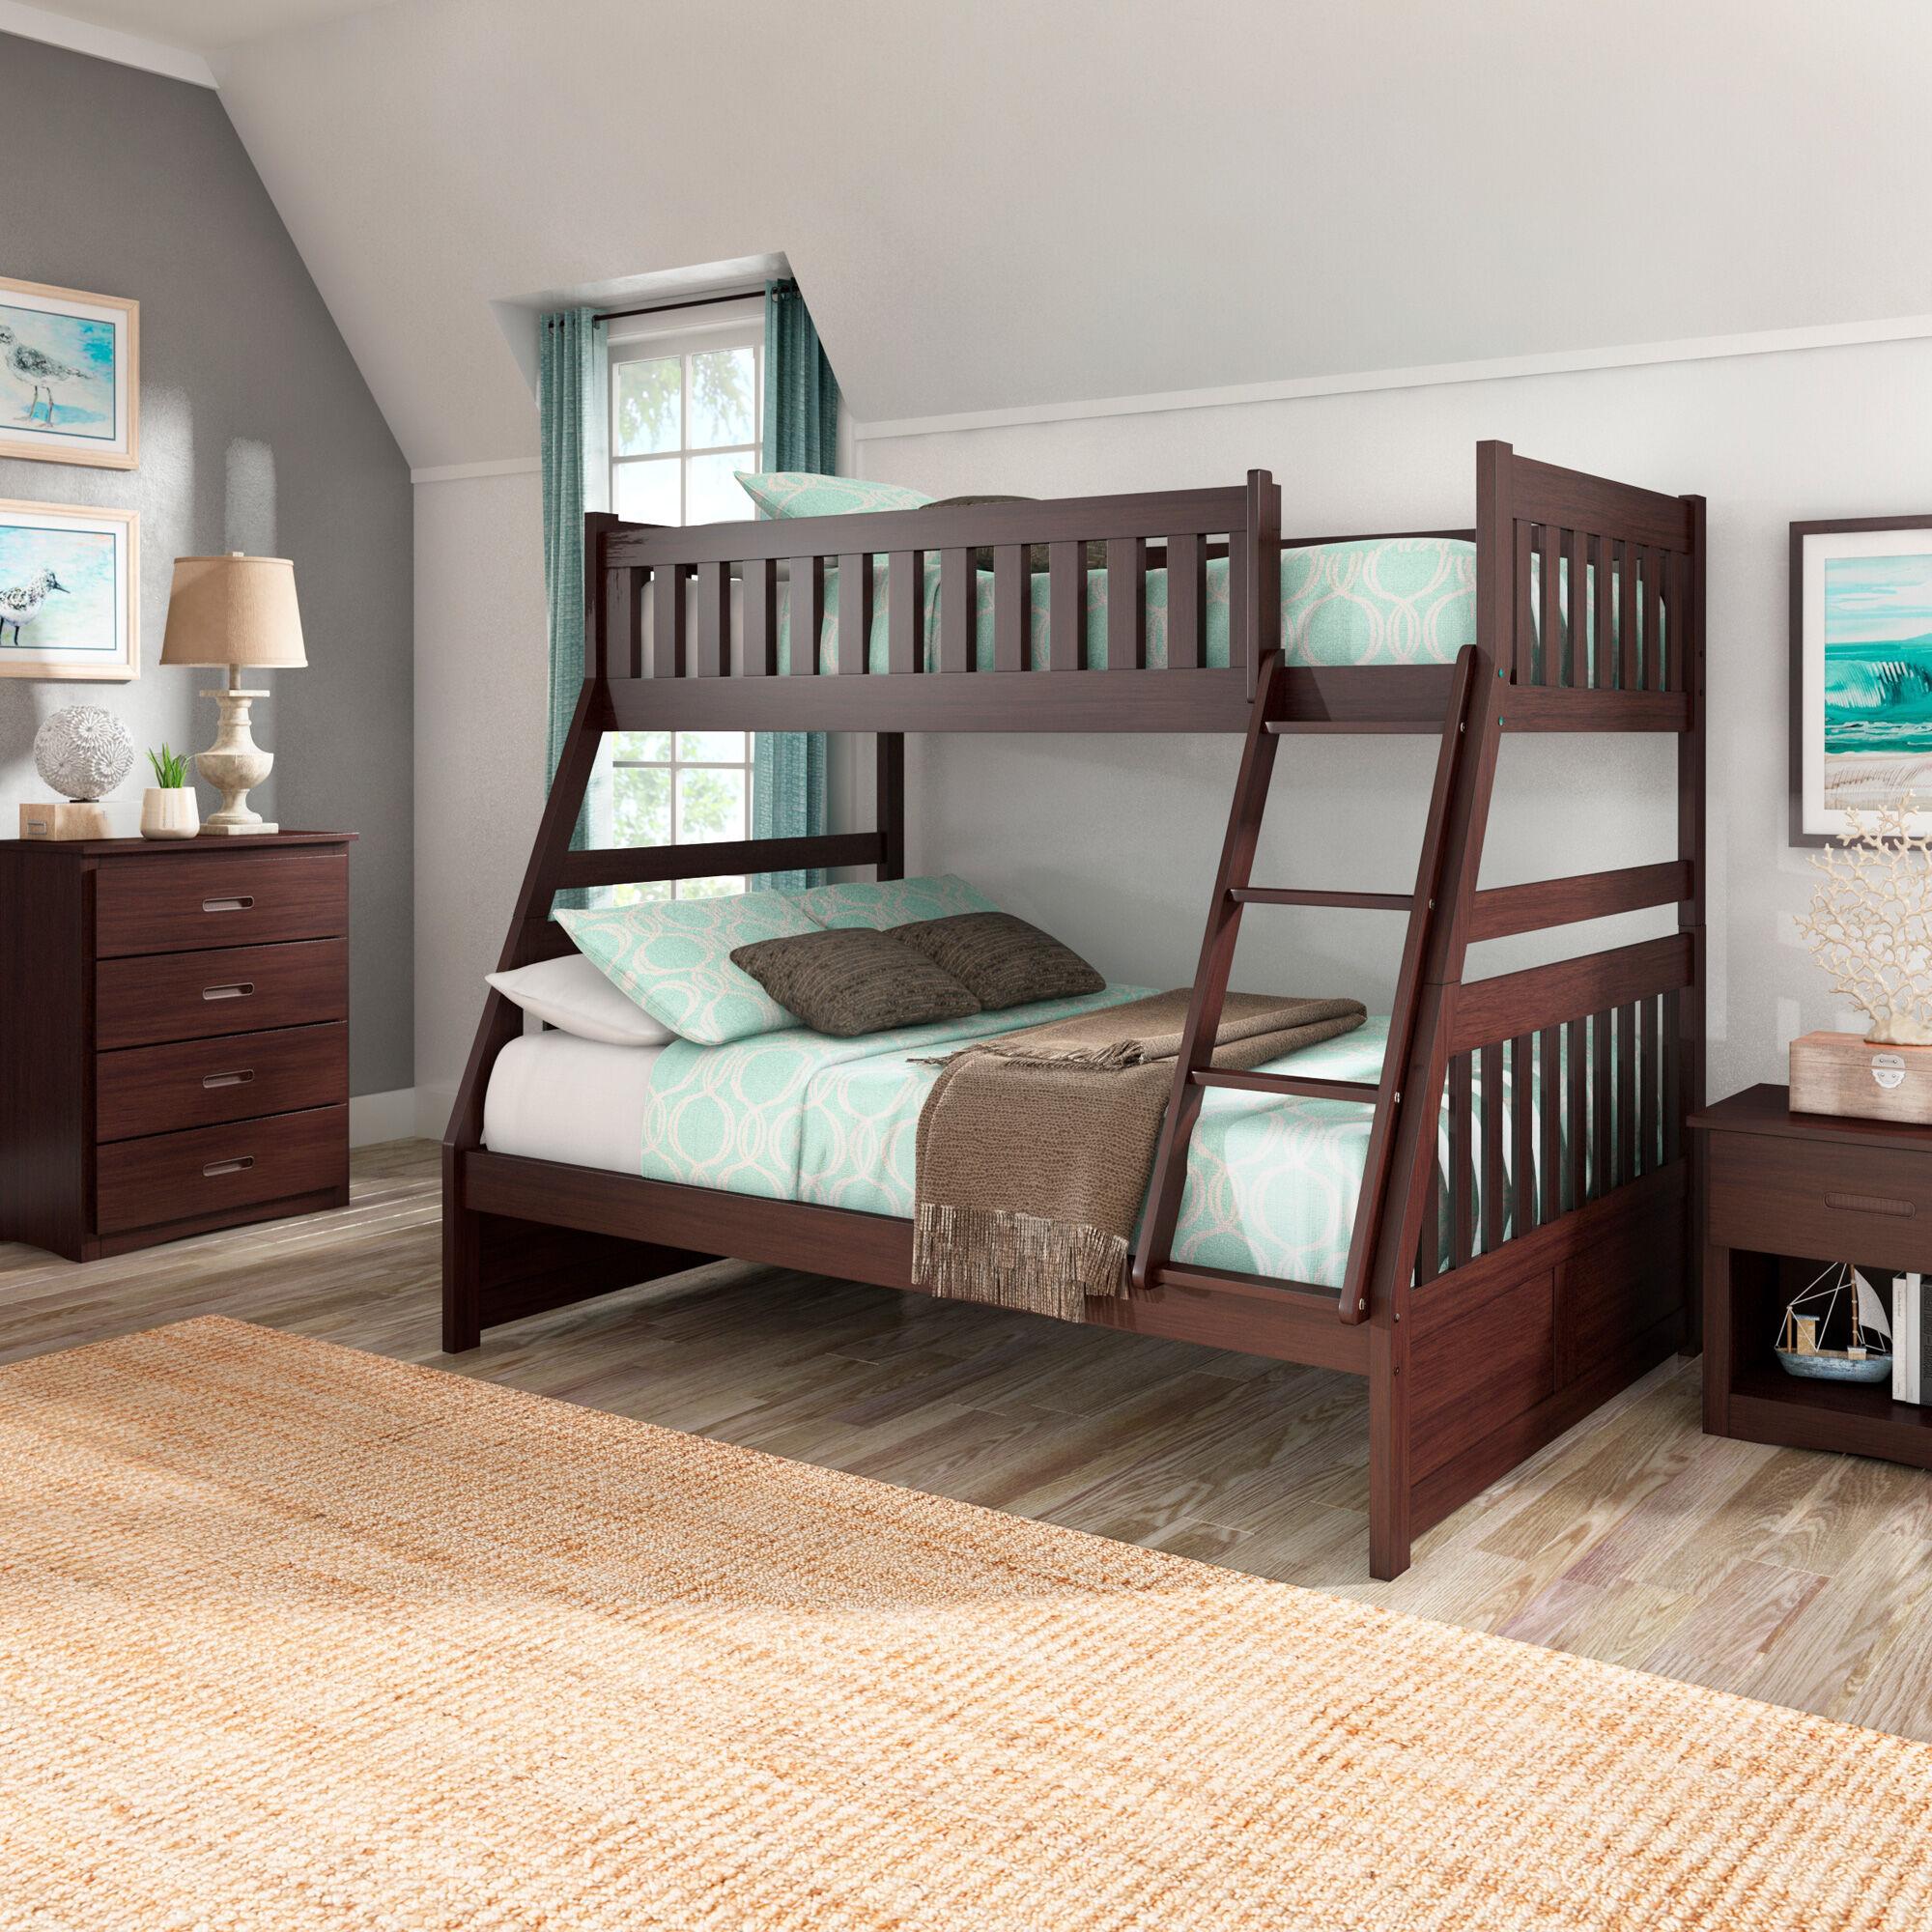 rowe bunk bed bedrooms slumberland on Slumberland Bunk Beds id=65134